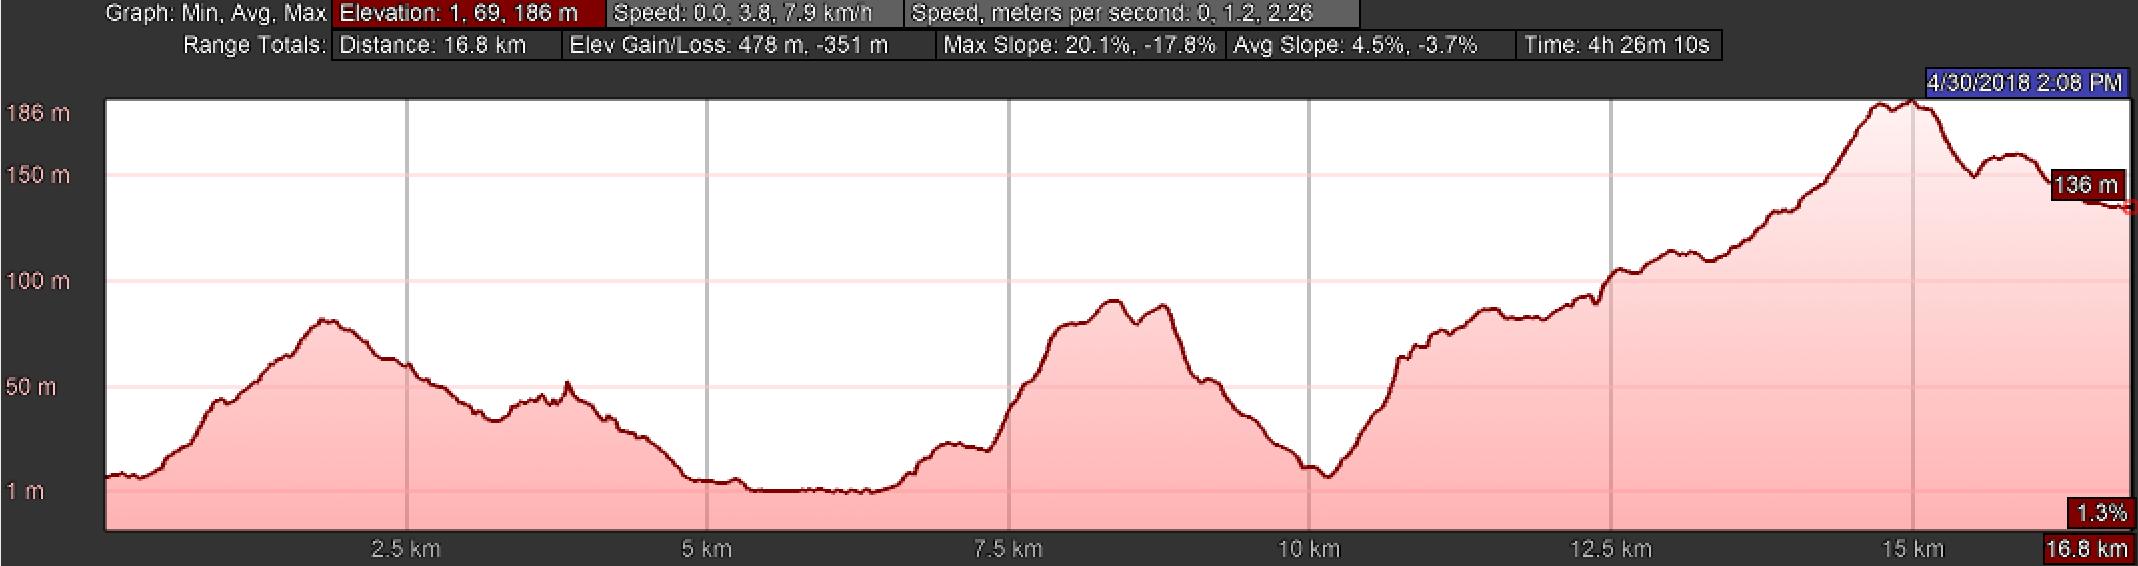 Elevation Profile Day One, Camino Inglés, La Coruña Arm, Part Two